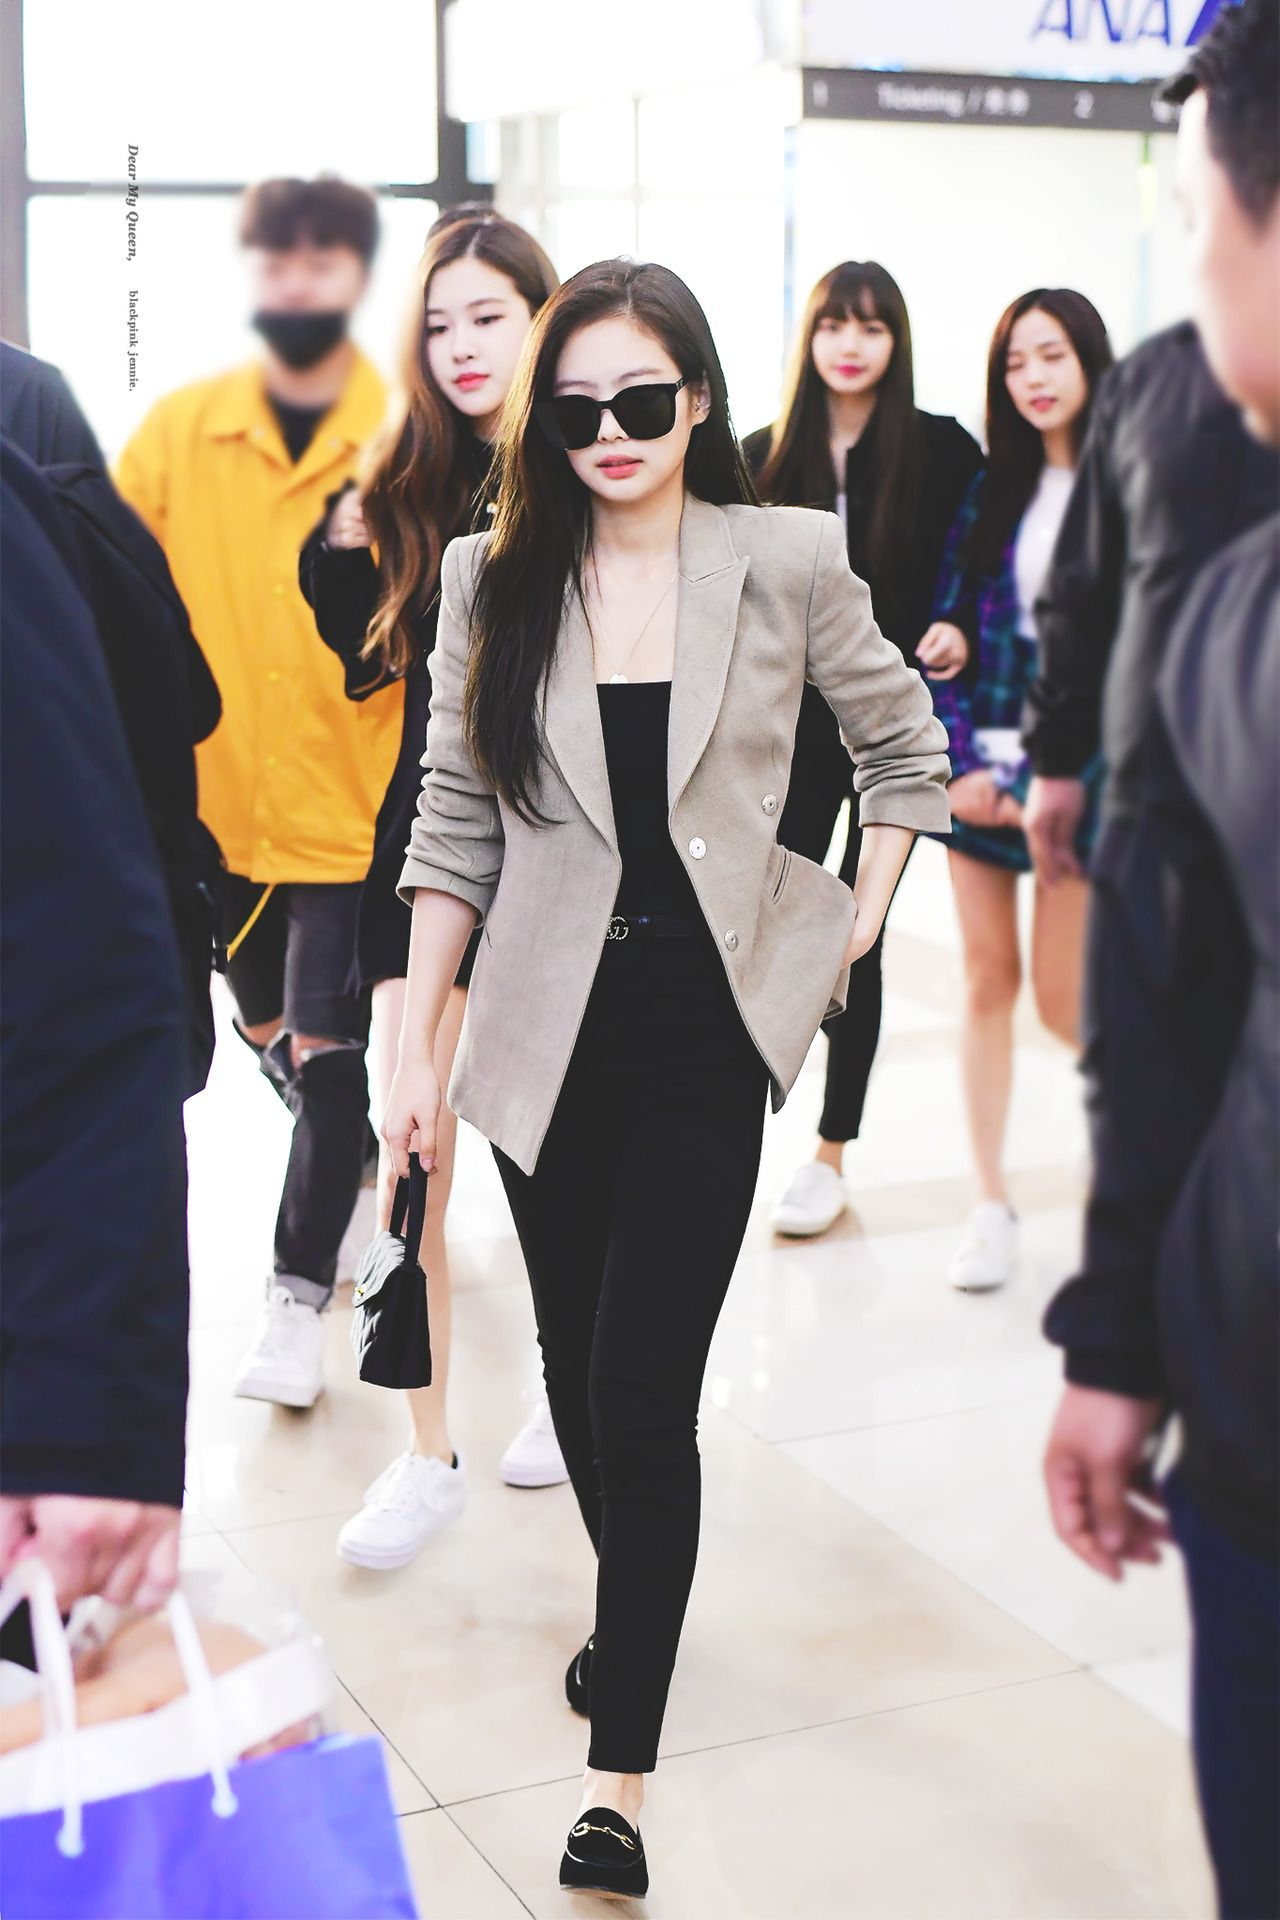 JENNIE U2014 AIRPORT #Jennie #KimJennie #Blackpink | Blackpink | Pinterest | Blackpink Kpop And ...